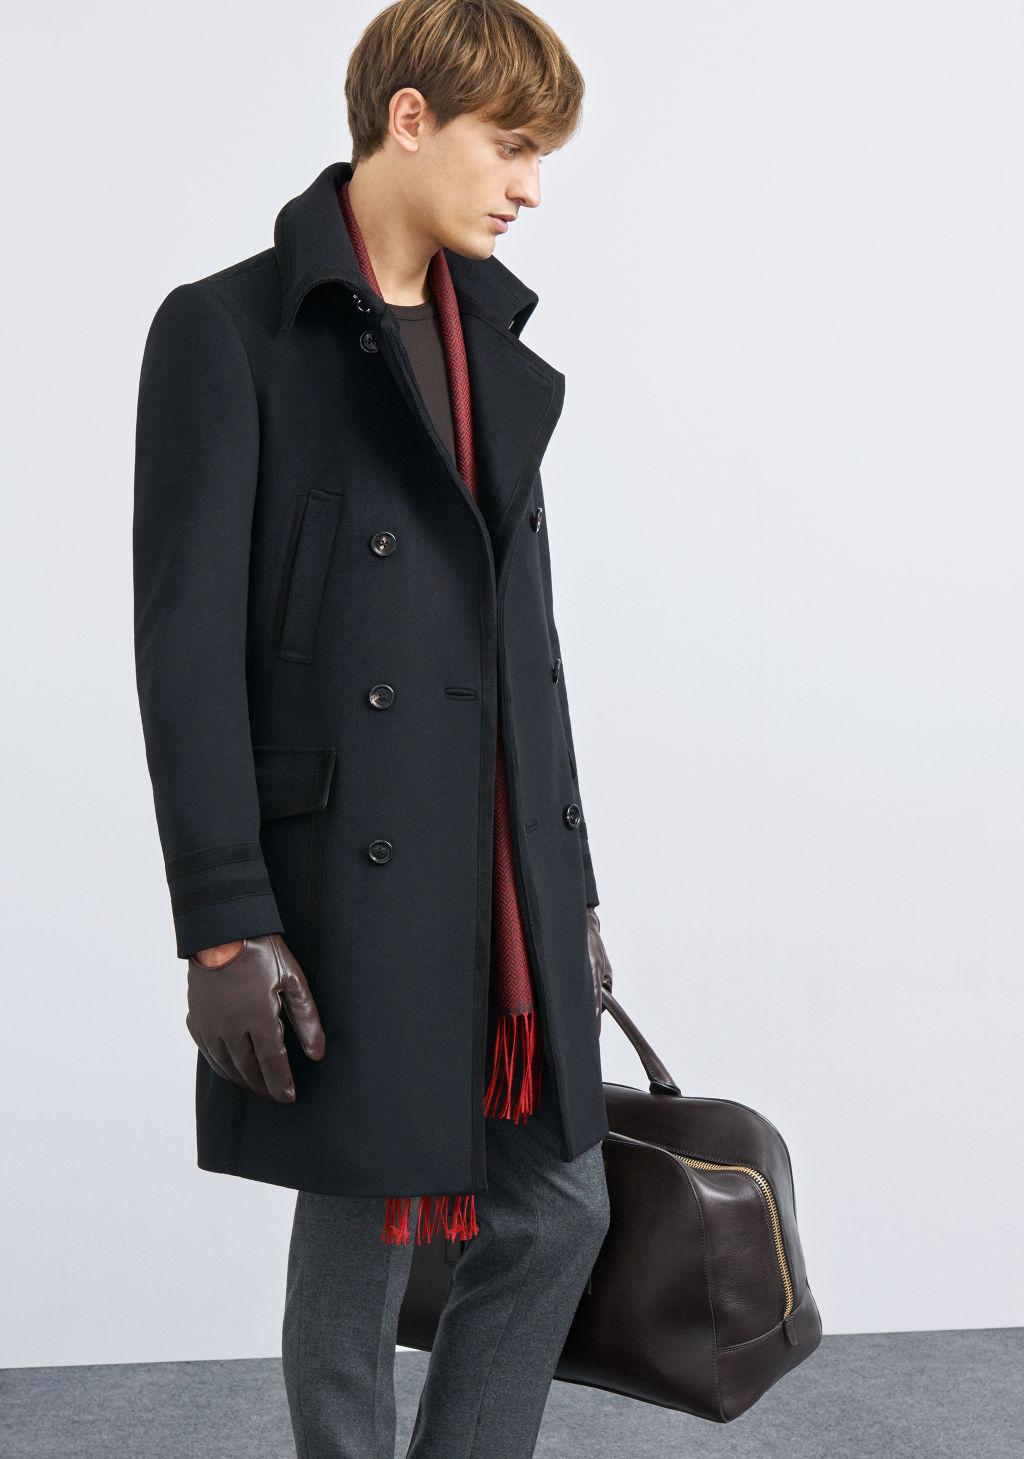 Zara Man Winter Look